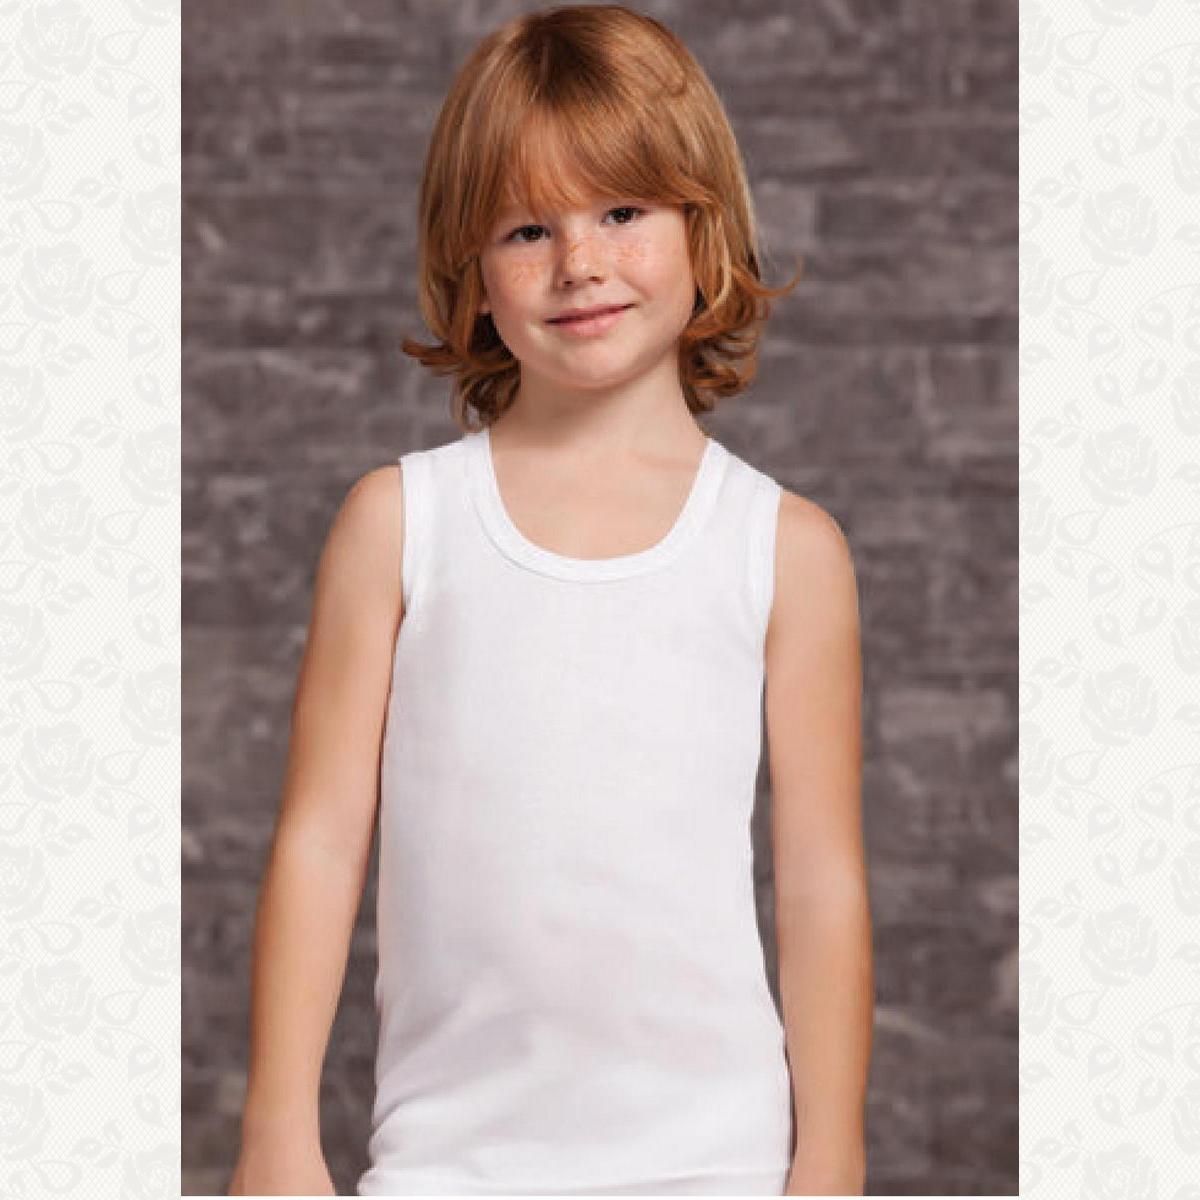 Майка для мальчика размер от 0 до 4, цвет белый, 6 шт.